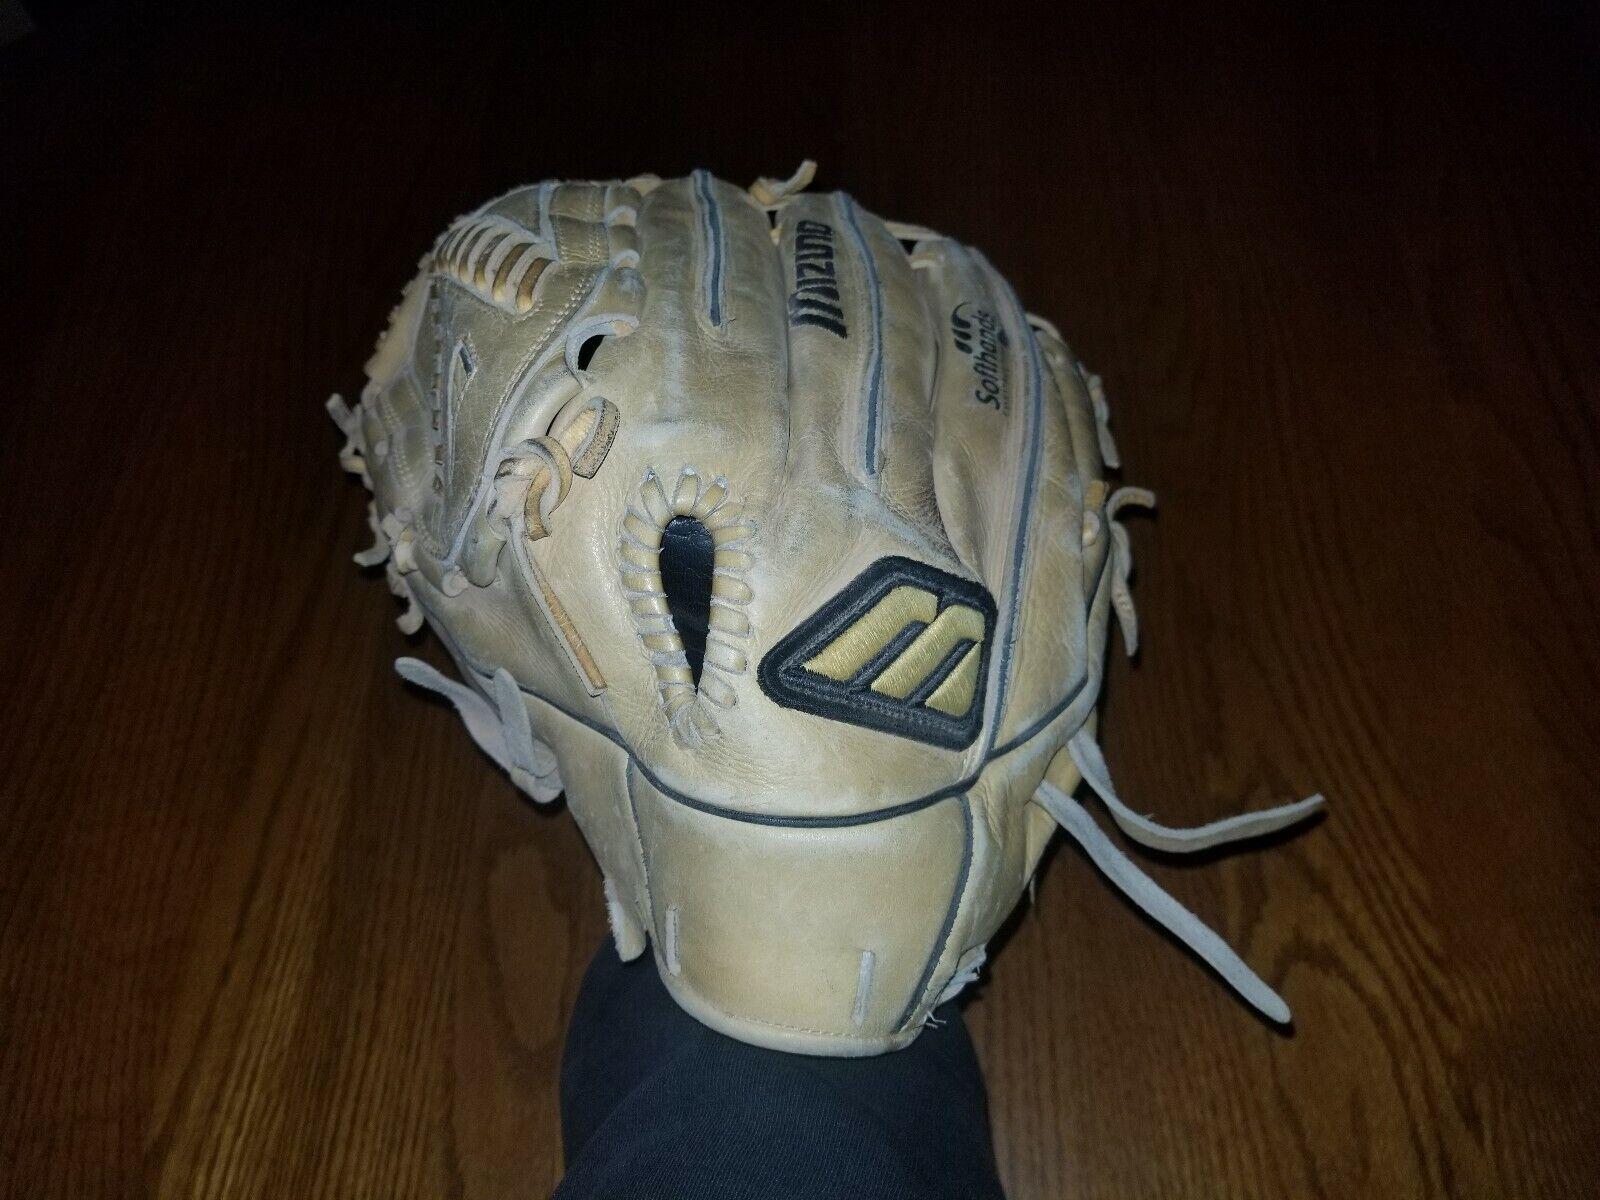 Mizuno Pro Limited GZP 15 3D Tecnología guante de béisbol LHT usado en excelente estado